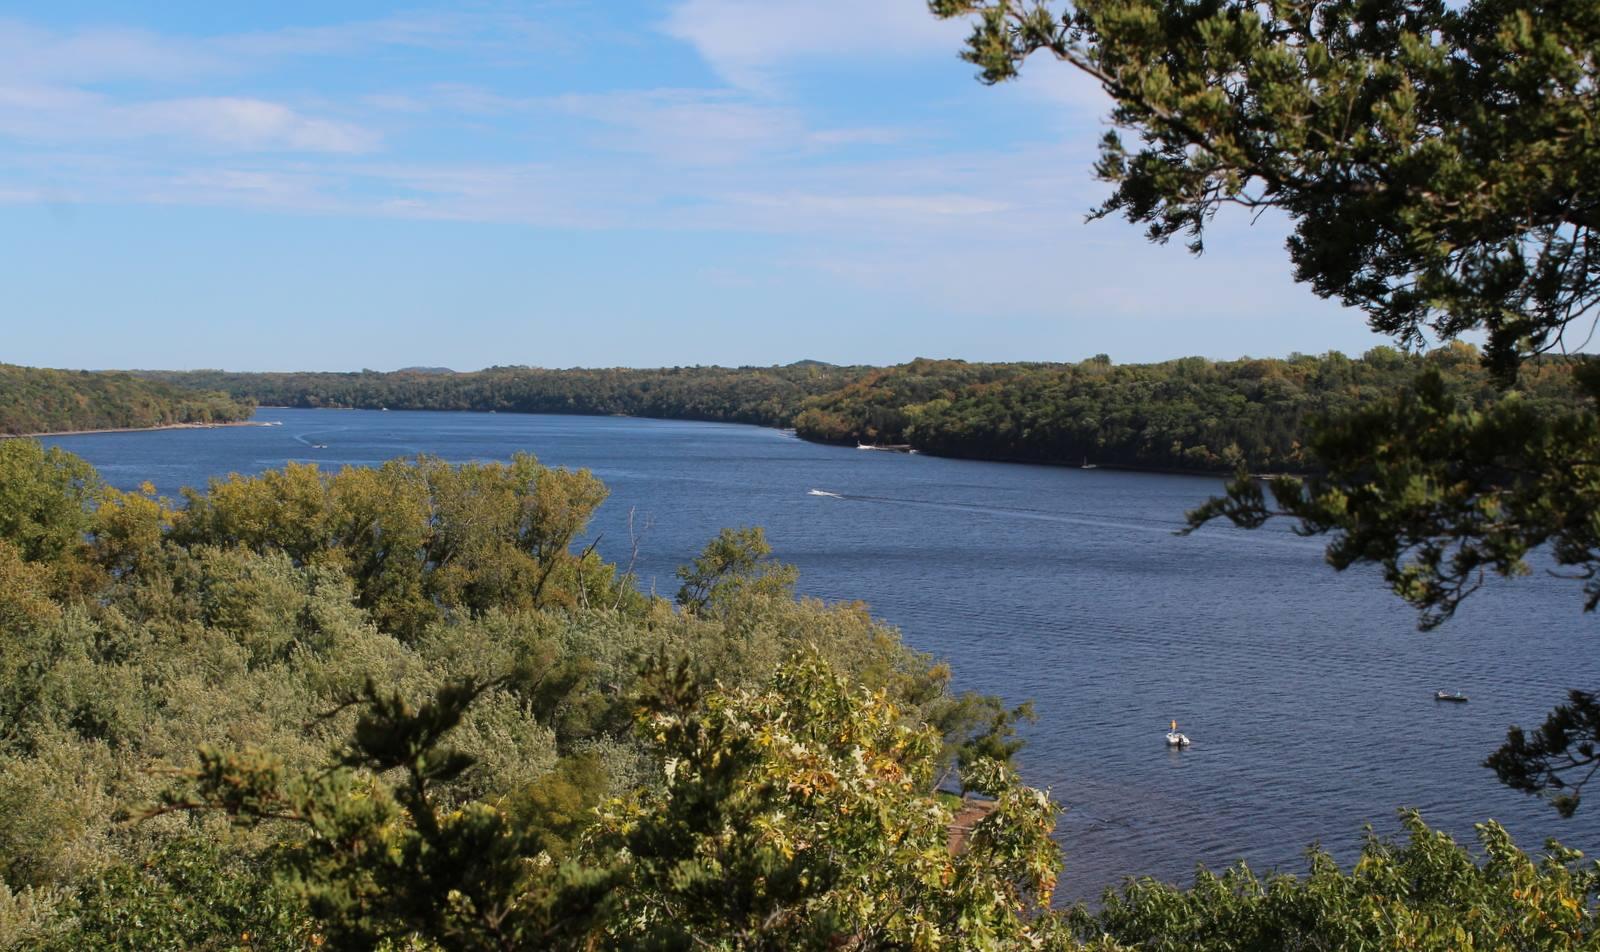 St. Croix River seen from Carpenter Nature Center